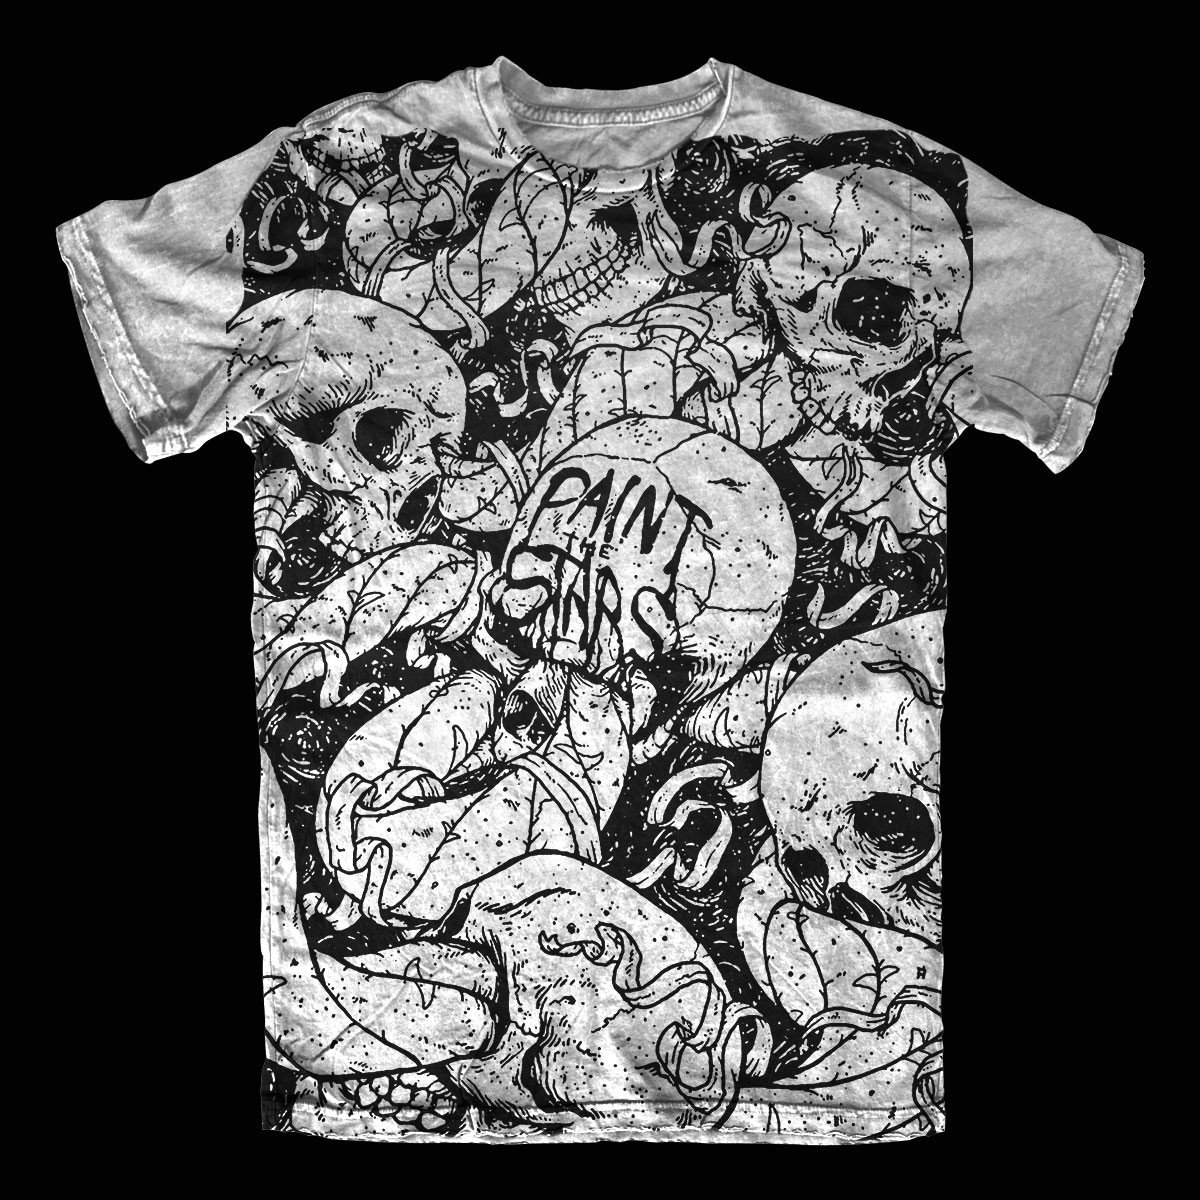 Paint the Stars – Skull Shirt